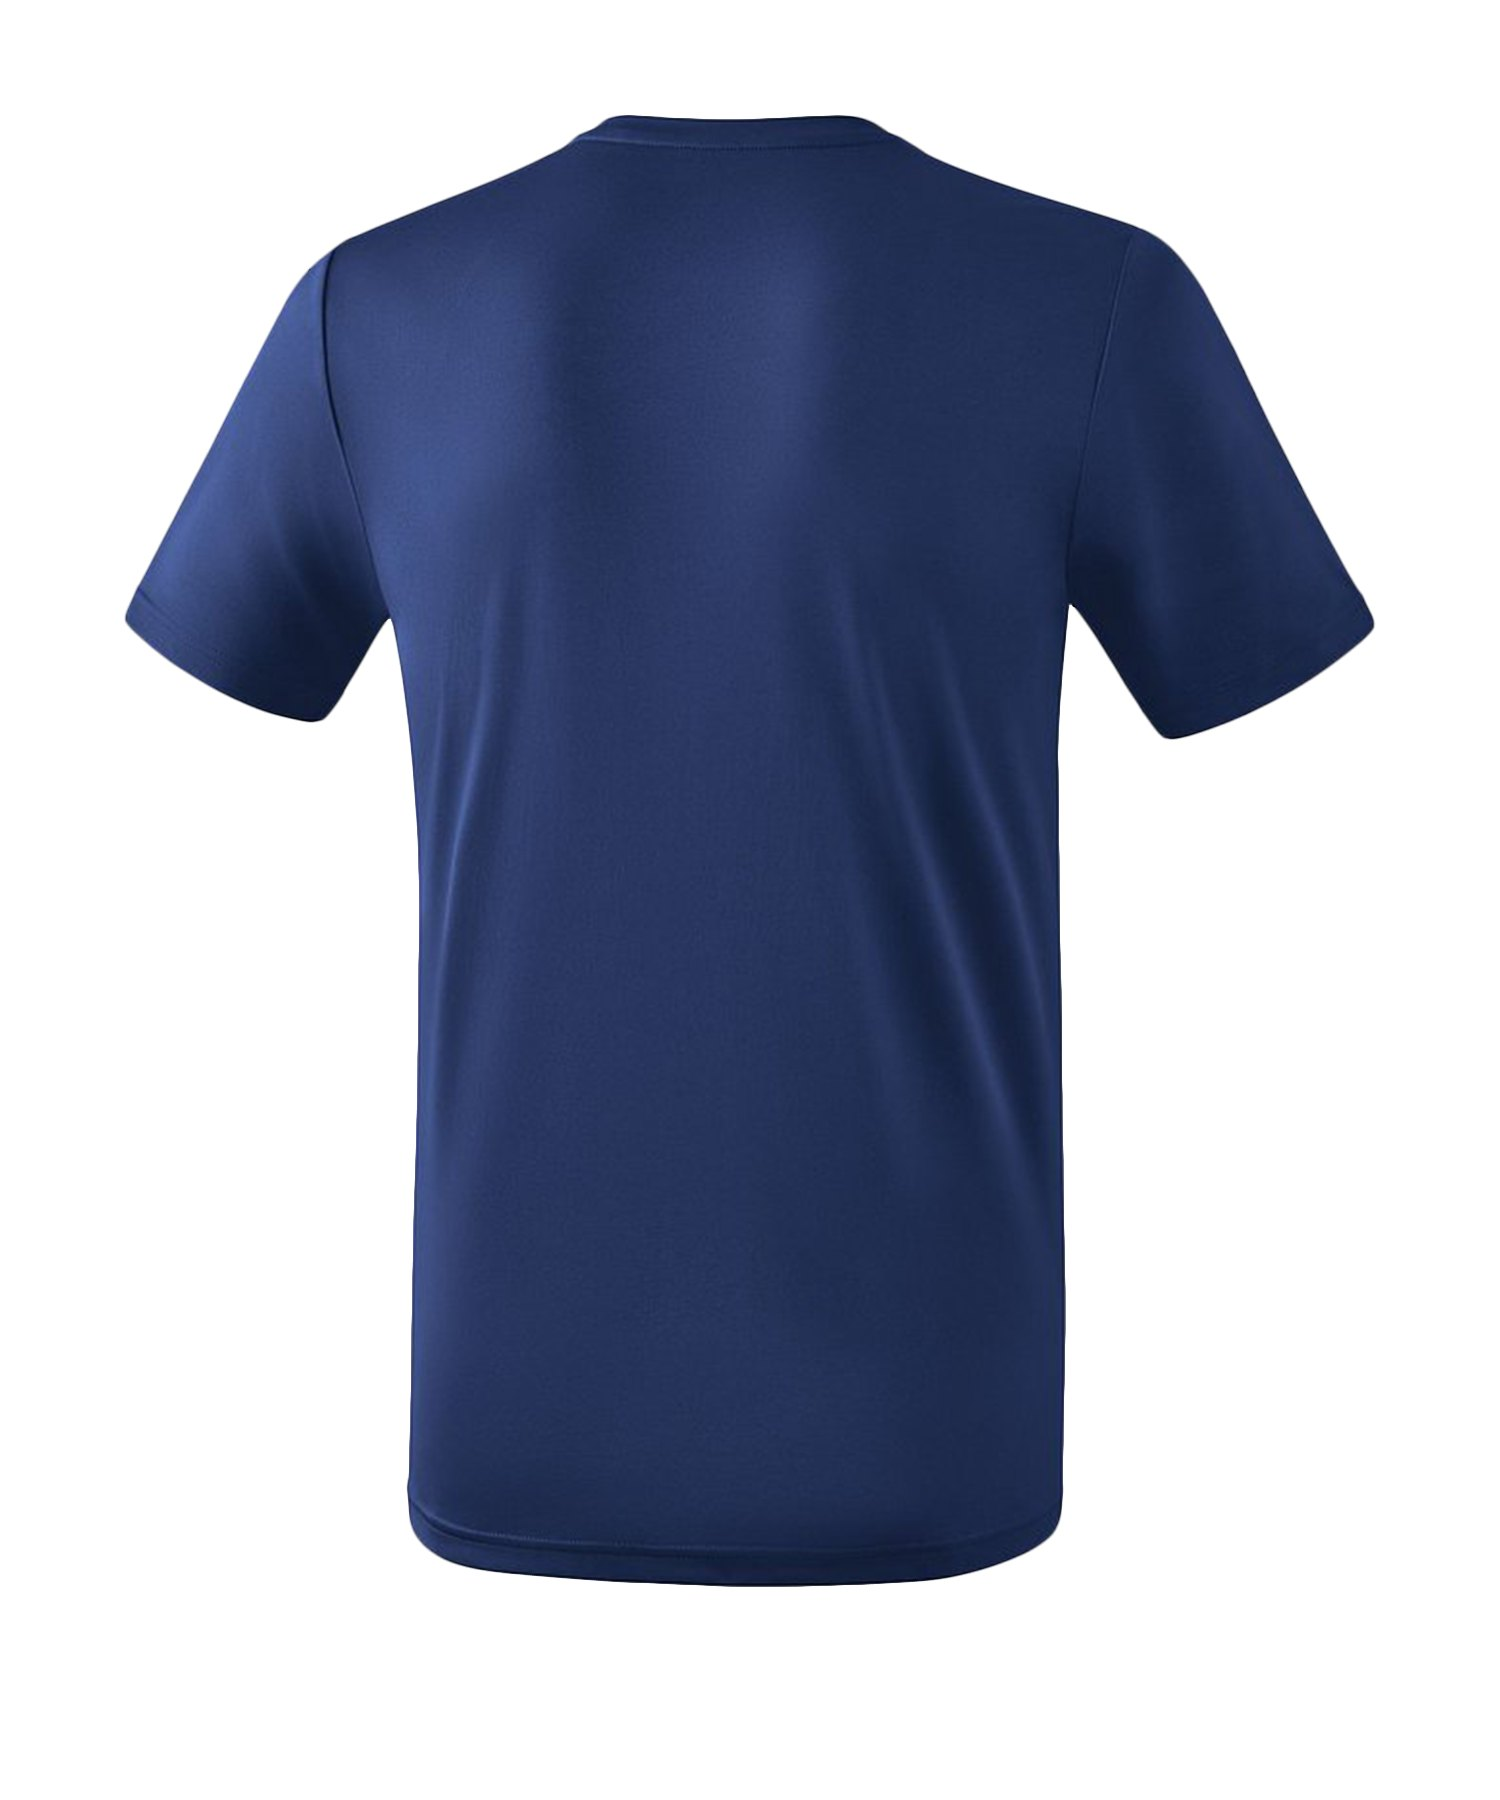 nike funktions t-shirt schwarz 140